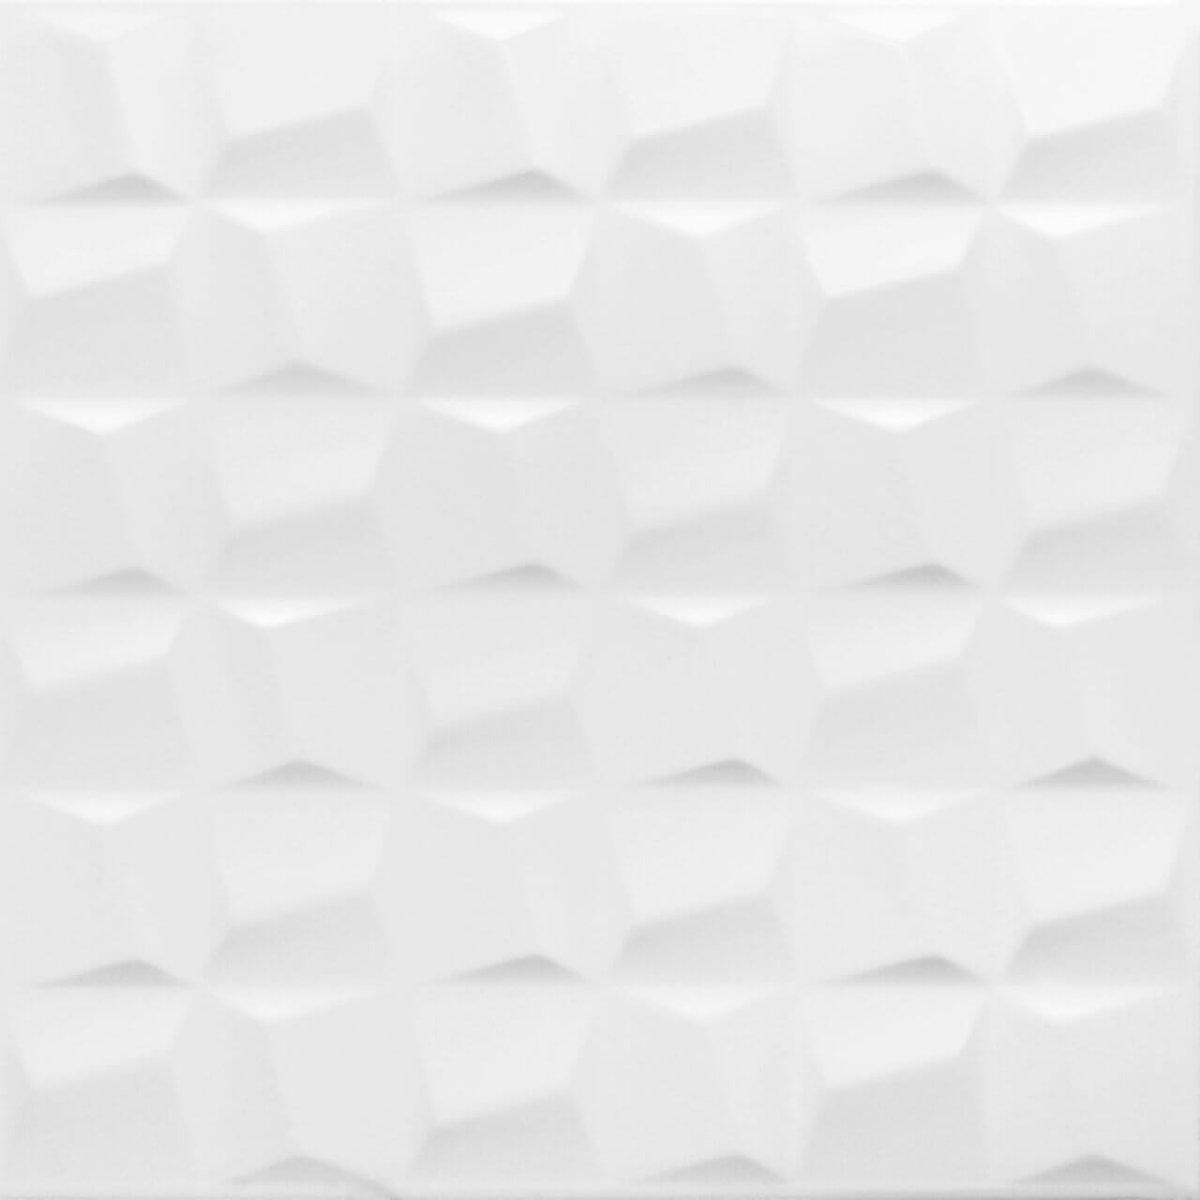 Eli Cubic White AC 450x900mm_Stiles_Product_Image